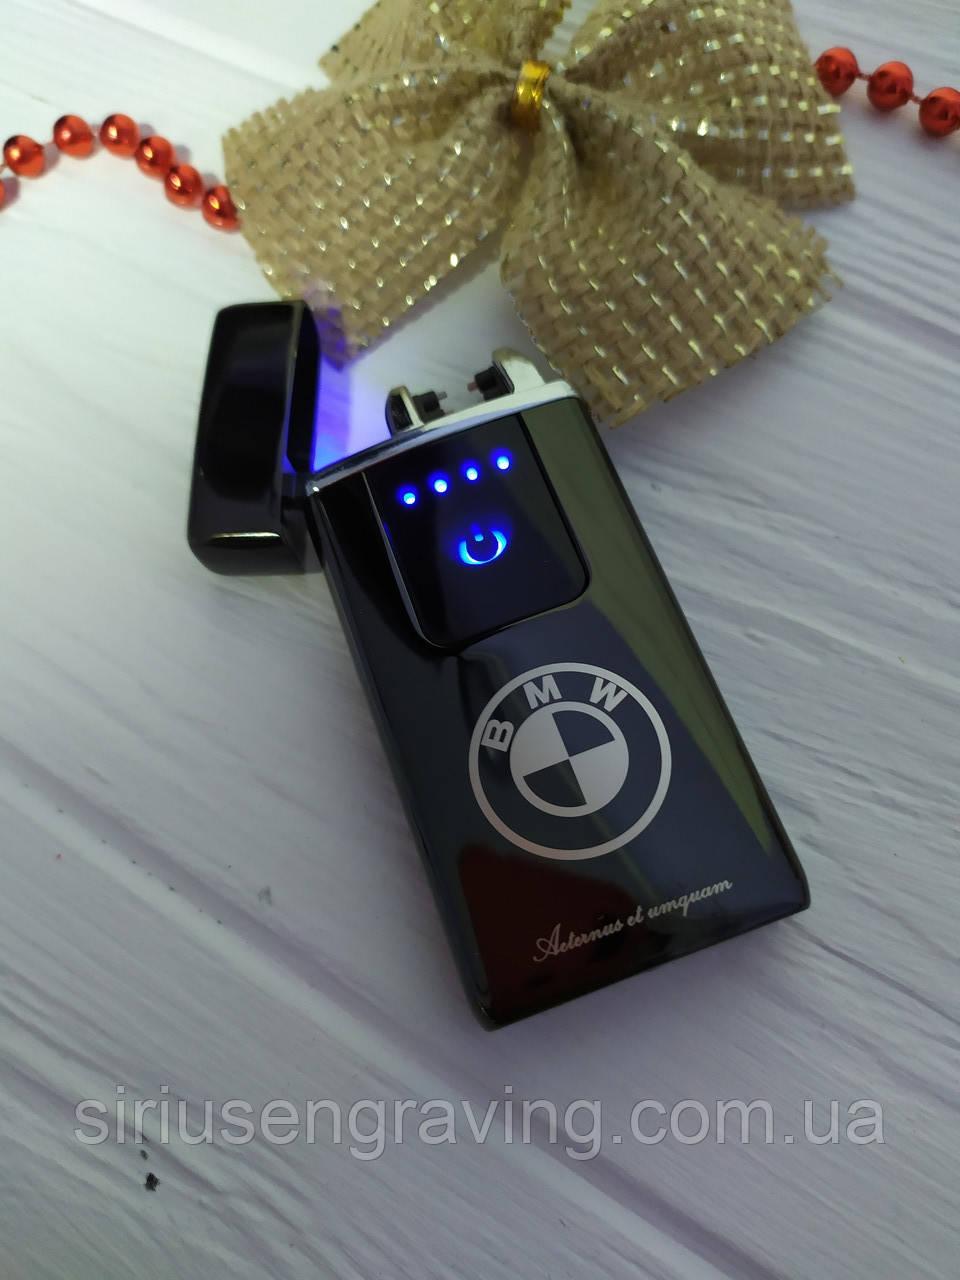 Электроимпульсная usb-зажигалка. Разные цвета. Гравировка на заказ